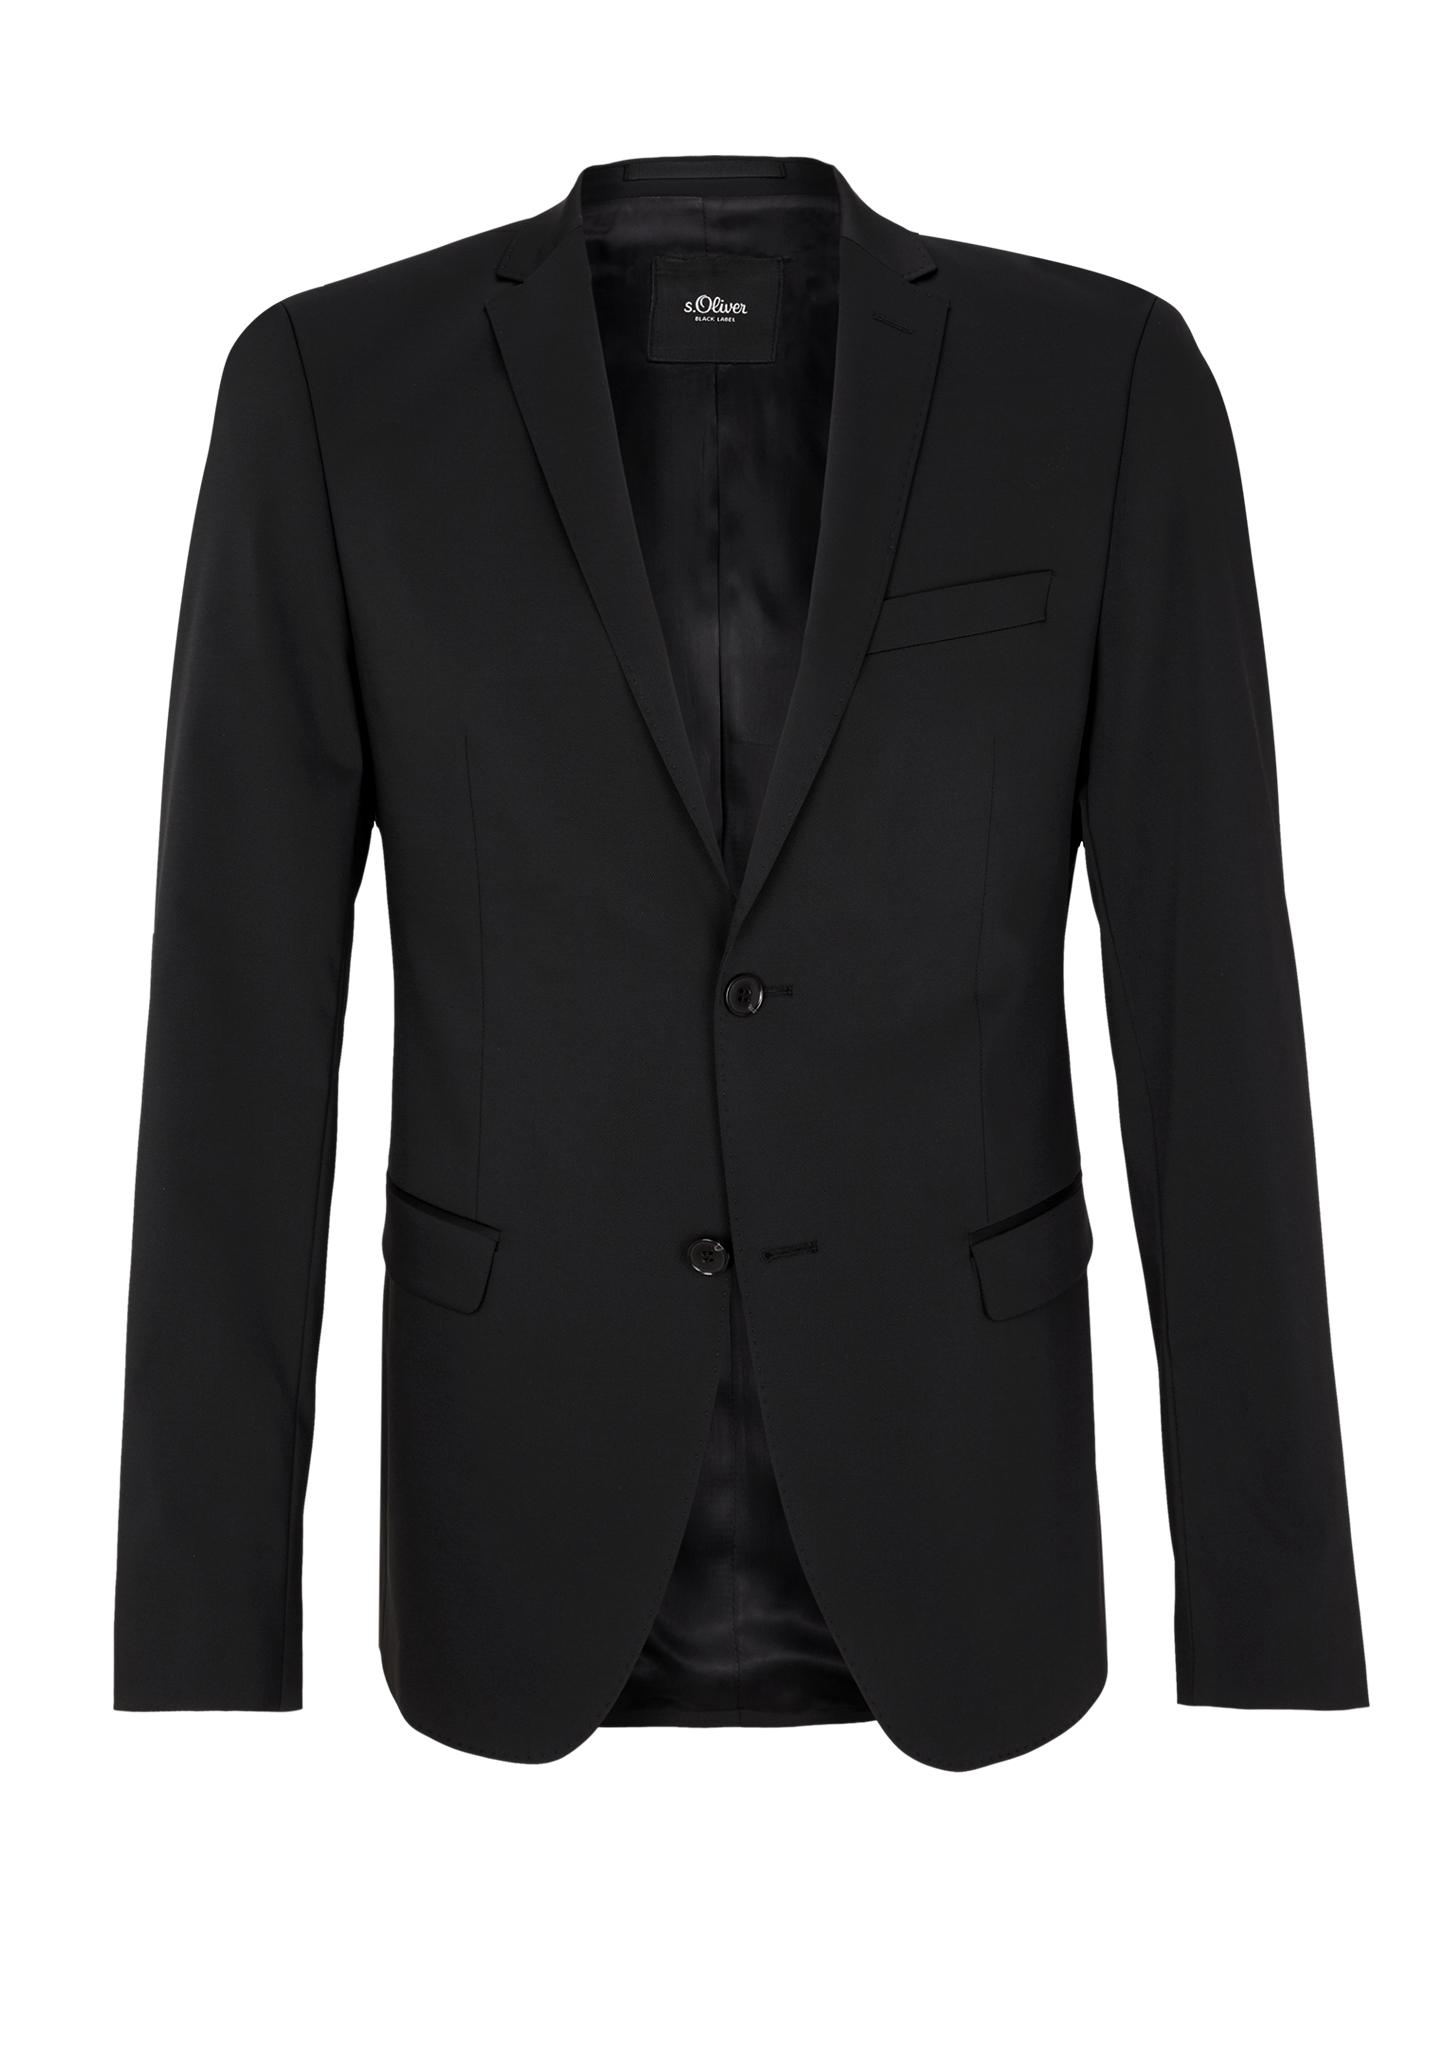 Sakko | Bekleidung | Grau/schwarz | Obermaterial 79% polyester -  19% schurwolle -  2% elasthan| futter 54% acetat -  46% viskose| Ärmelfutter 100% viskose | s.Oliver BLACK LABEL